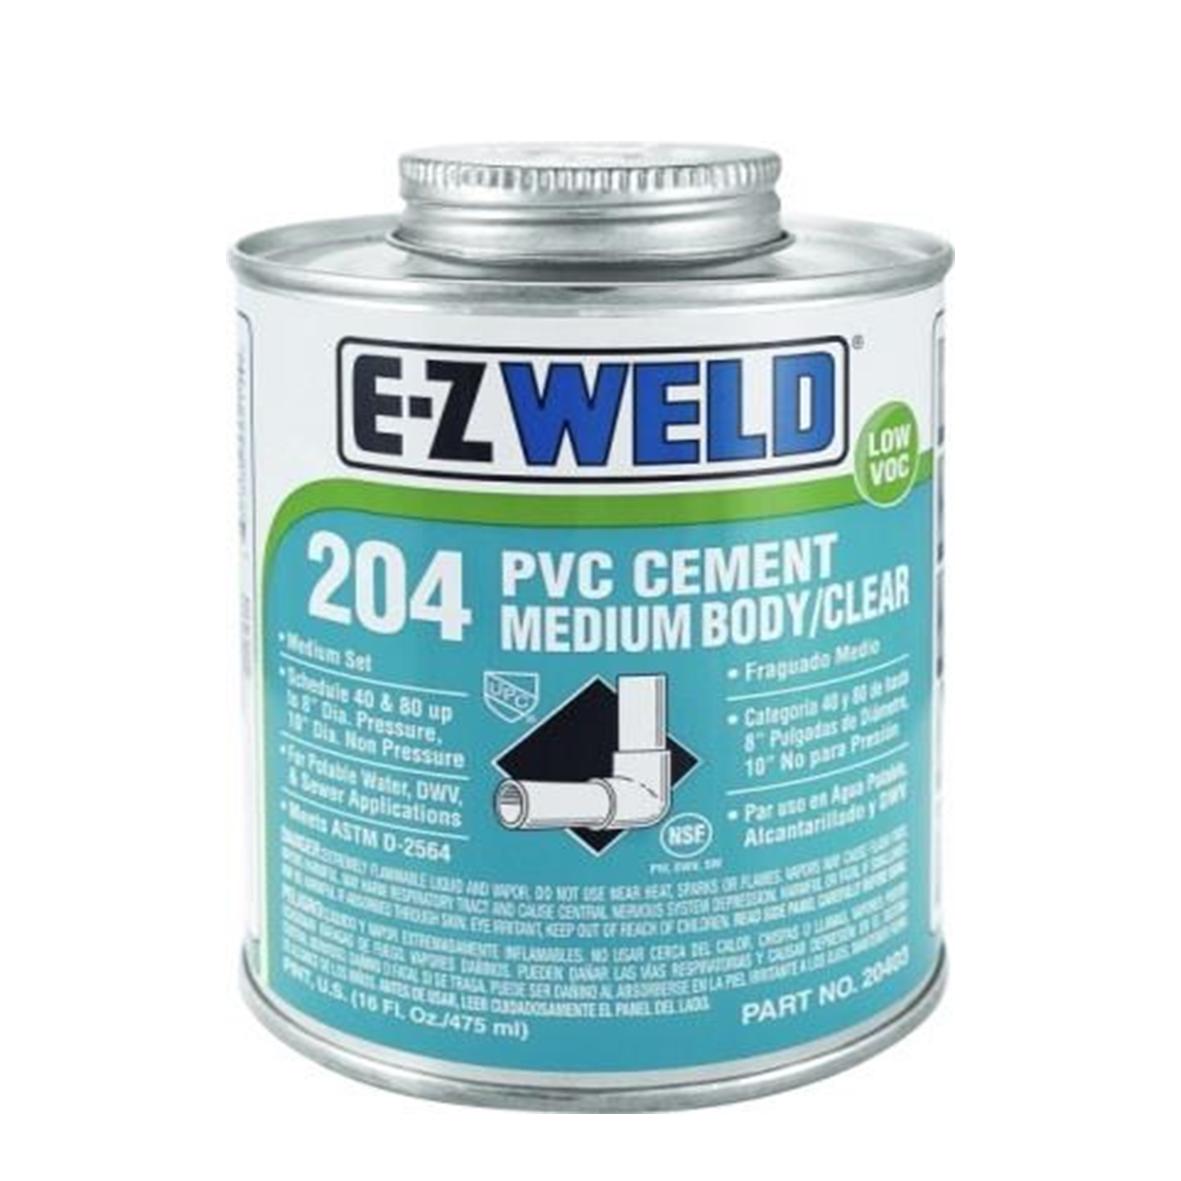 E-Z Weld 204 PVC Cement Medium Body / Clear